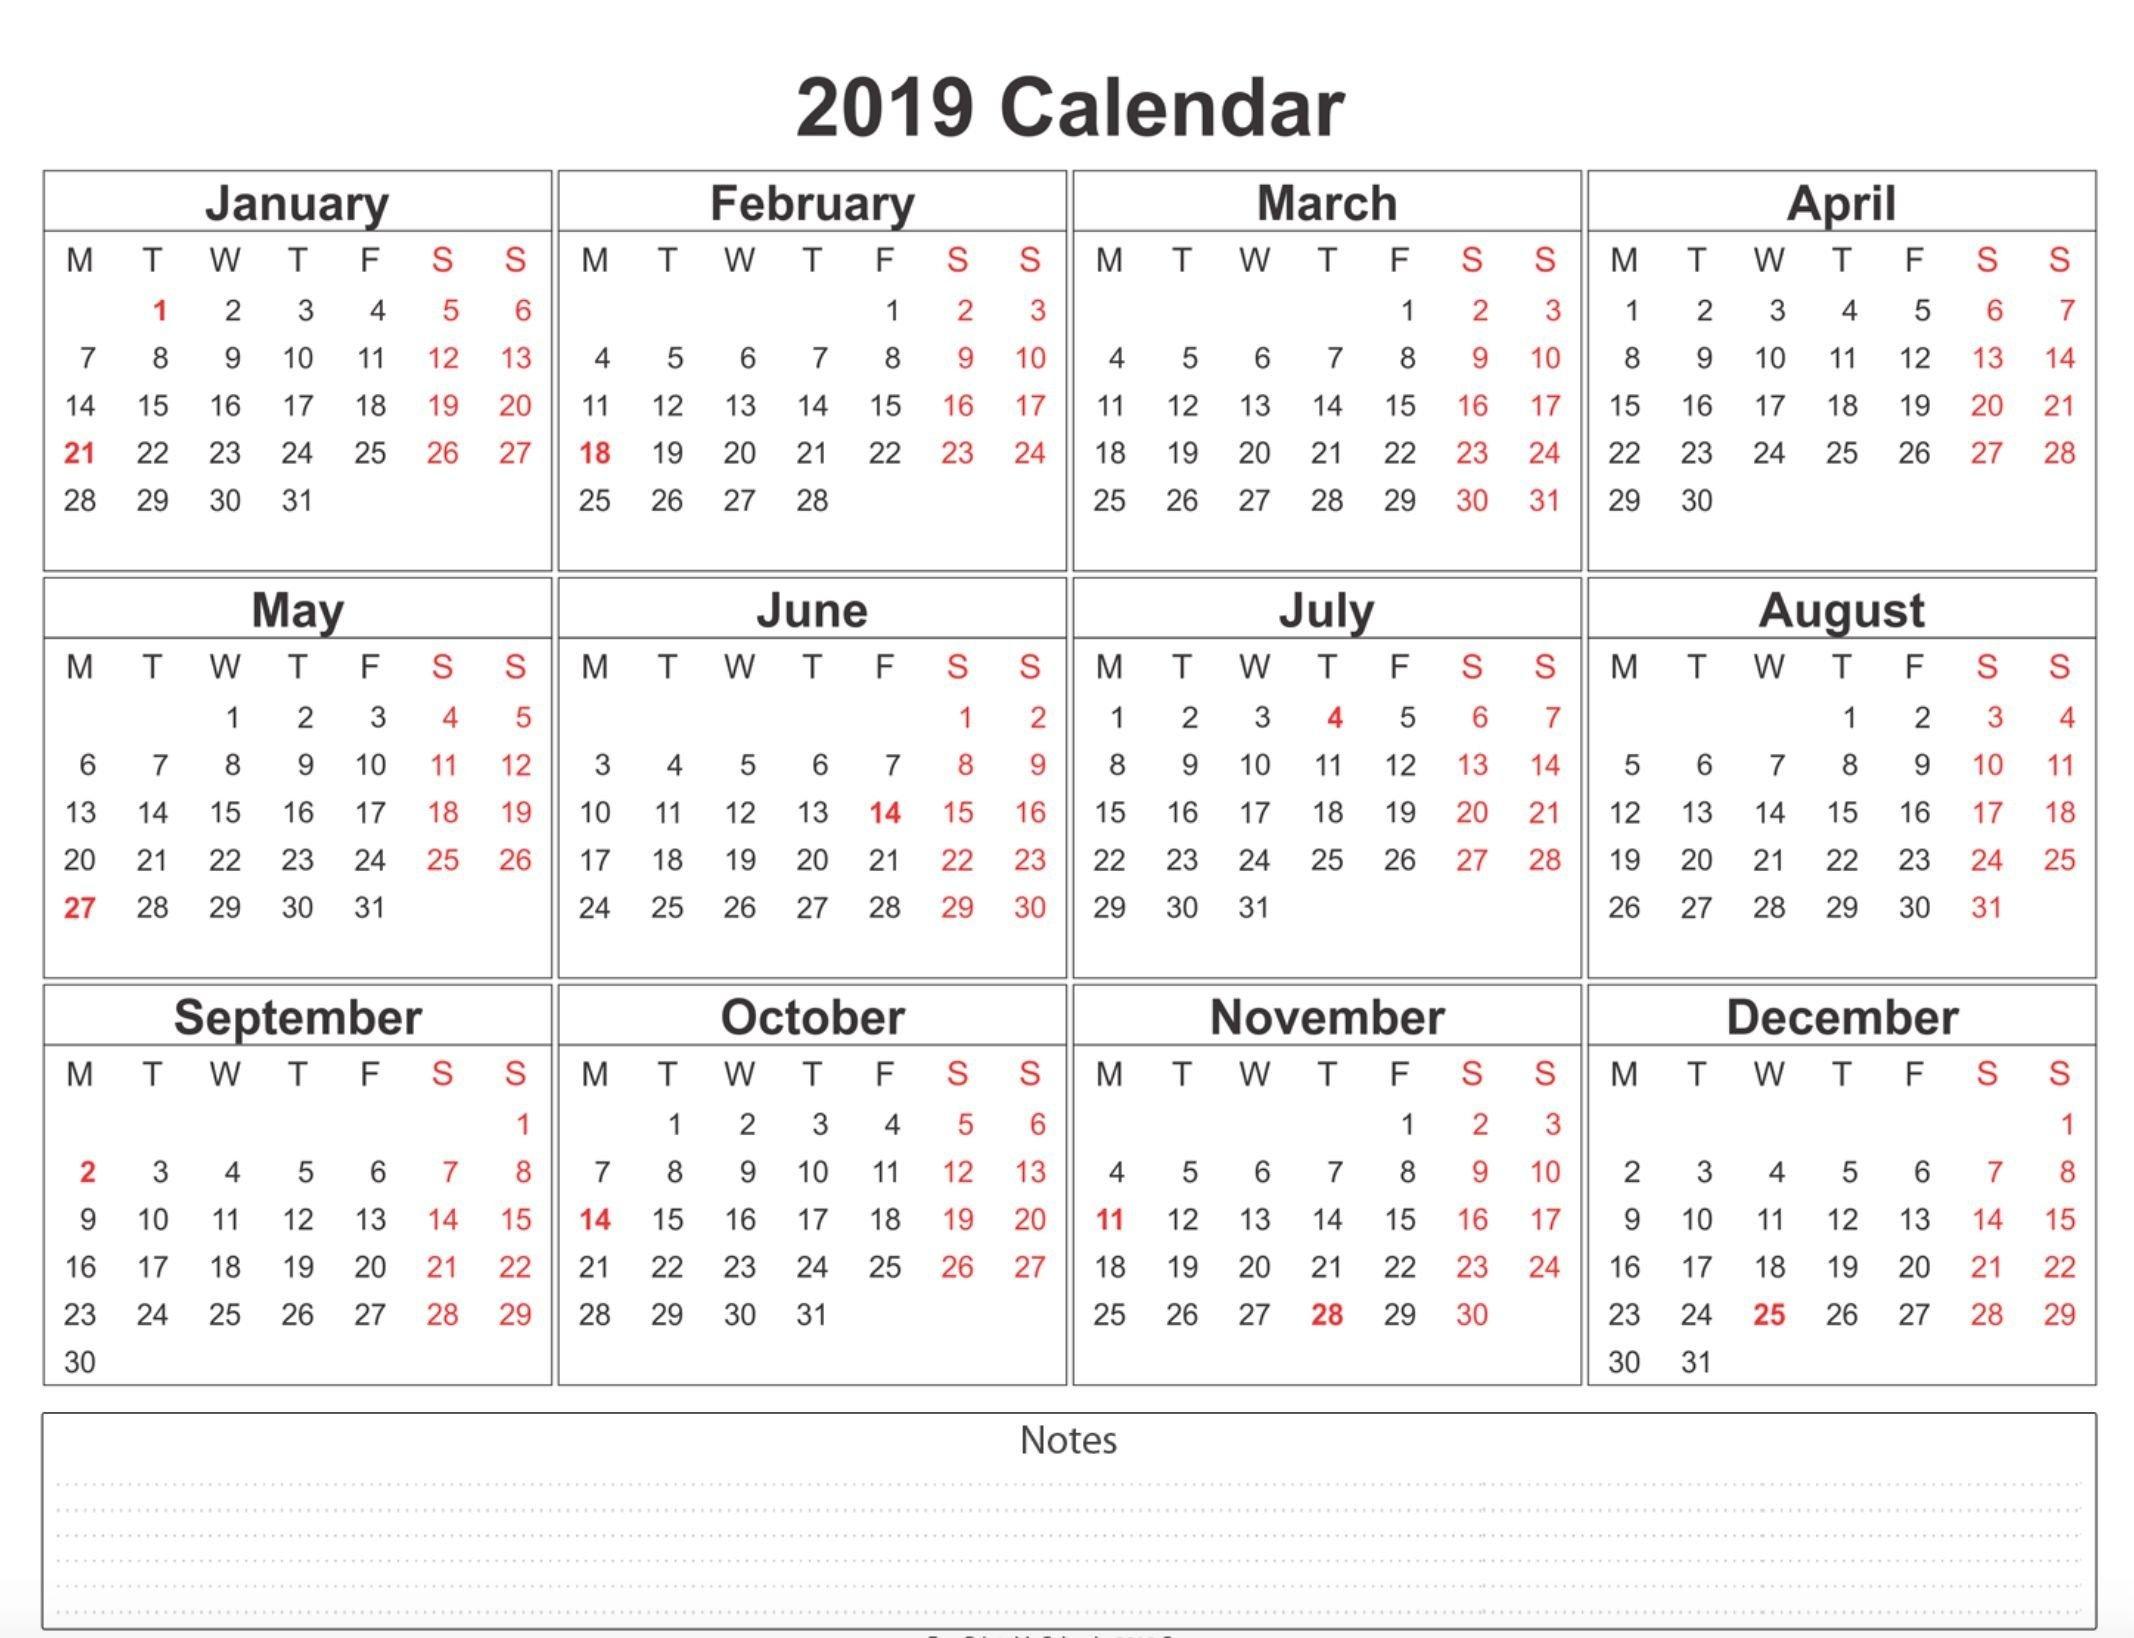 2019 Weekly Calendar Printable | 2019 Calendars | 12 Month Calendar Printable 2019 Calendar